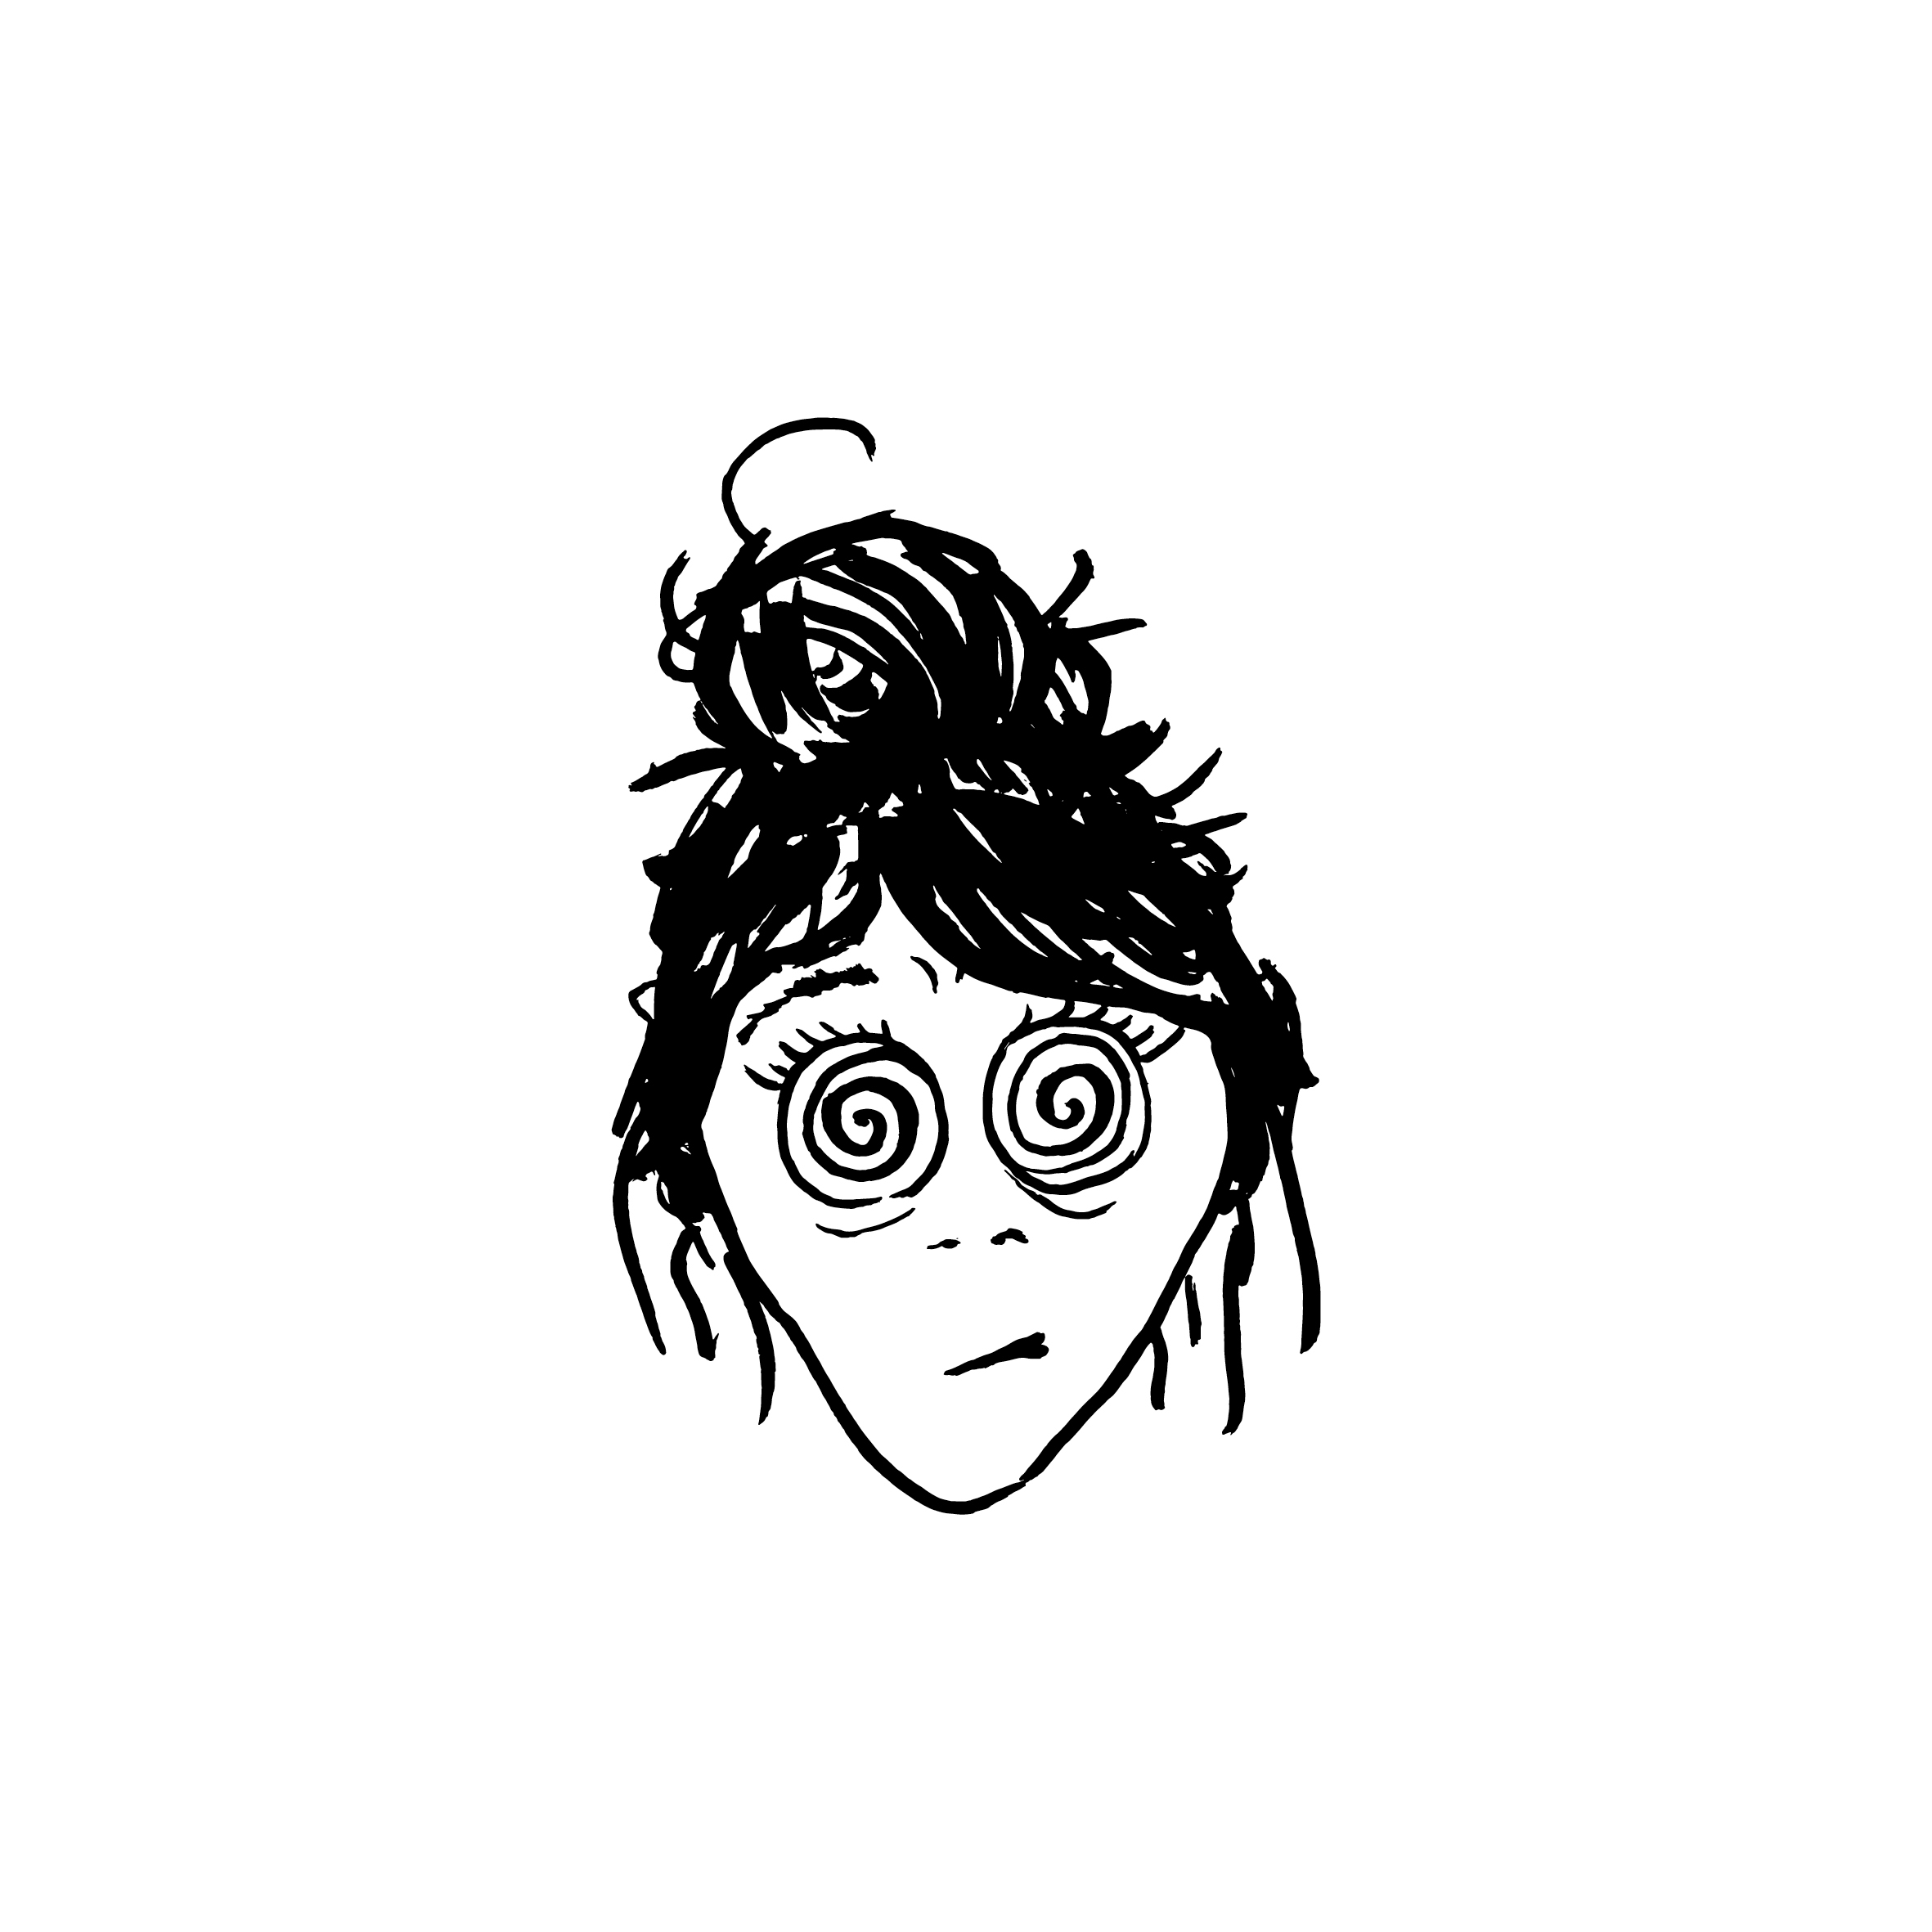 TheMumRants_Illustrations_v2.23.jpg